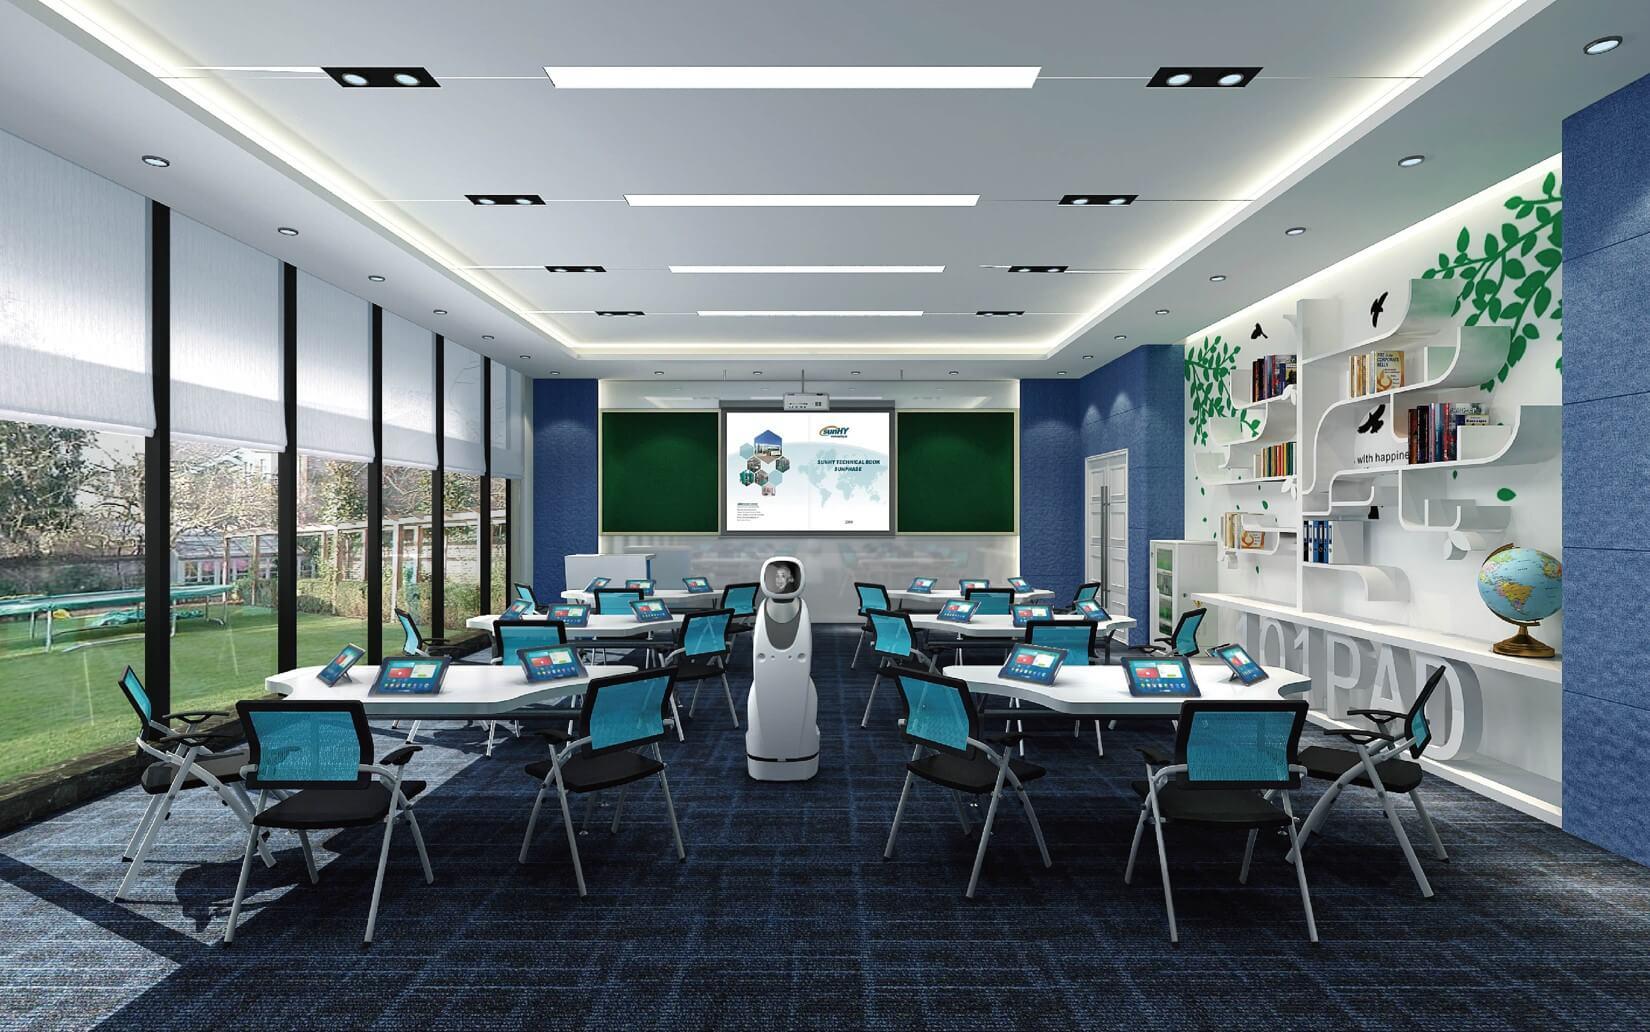 101 Smart Classroom Solution